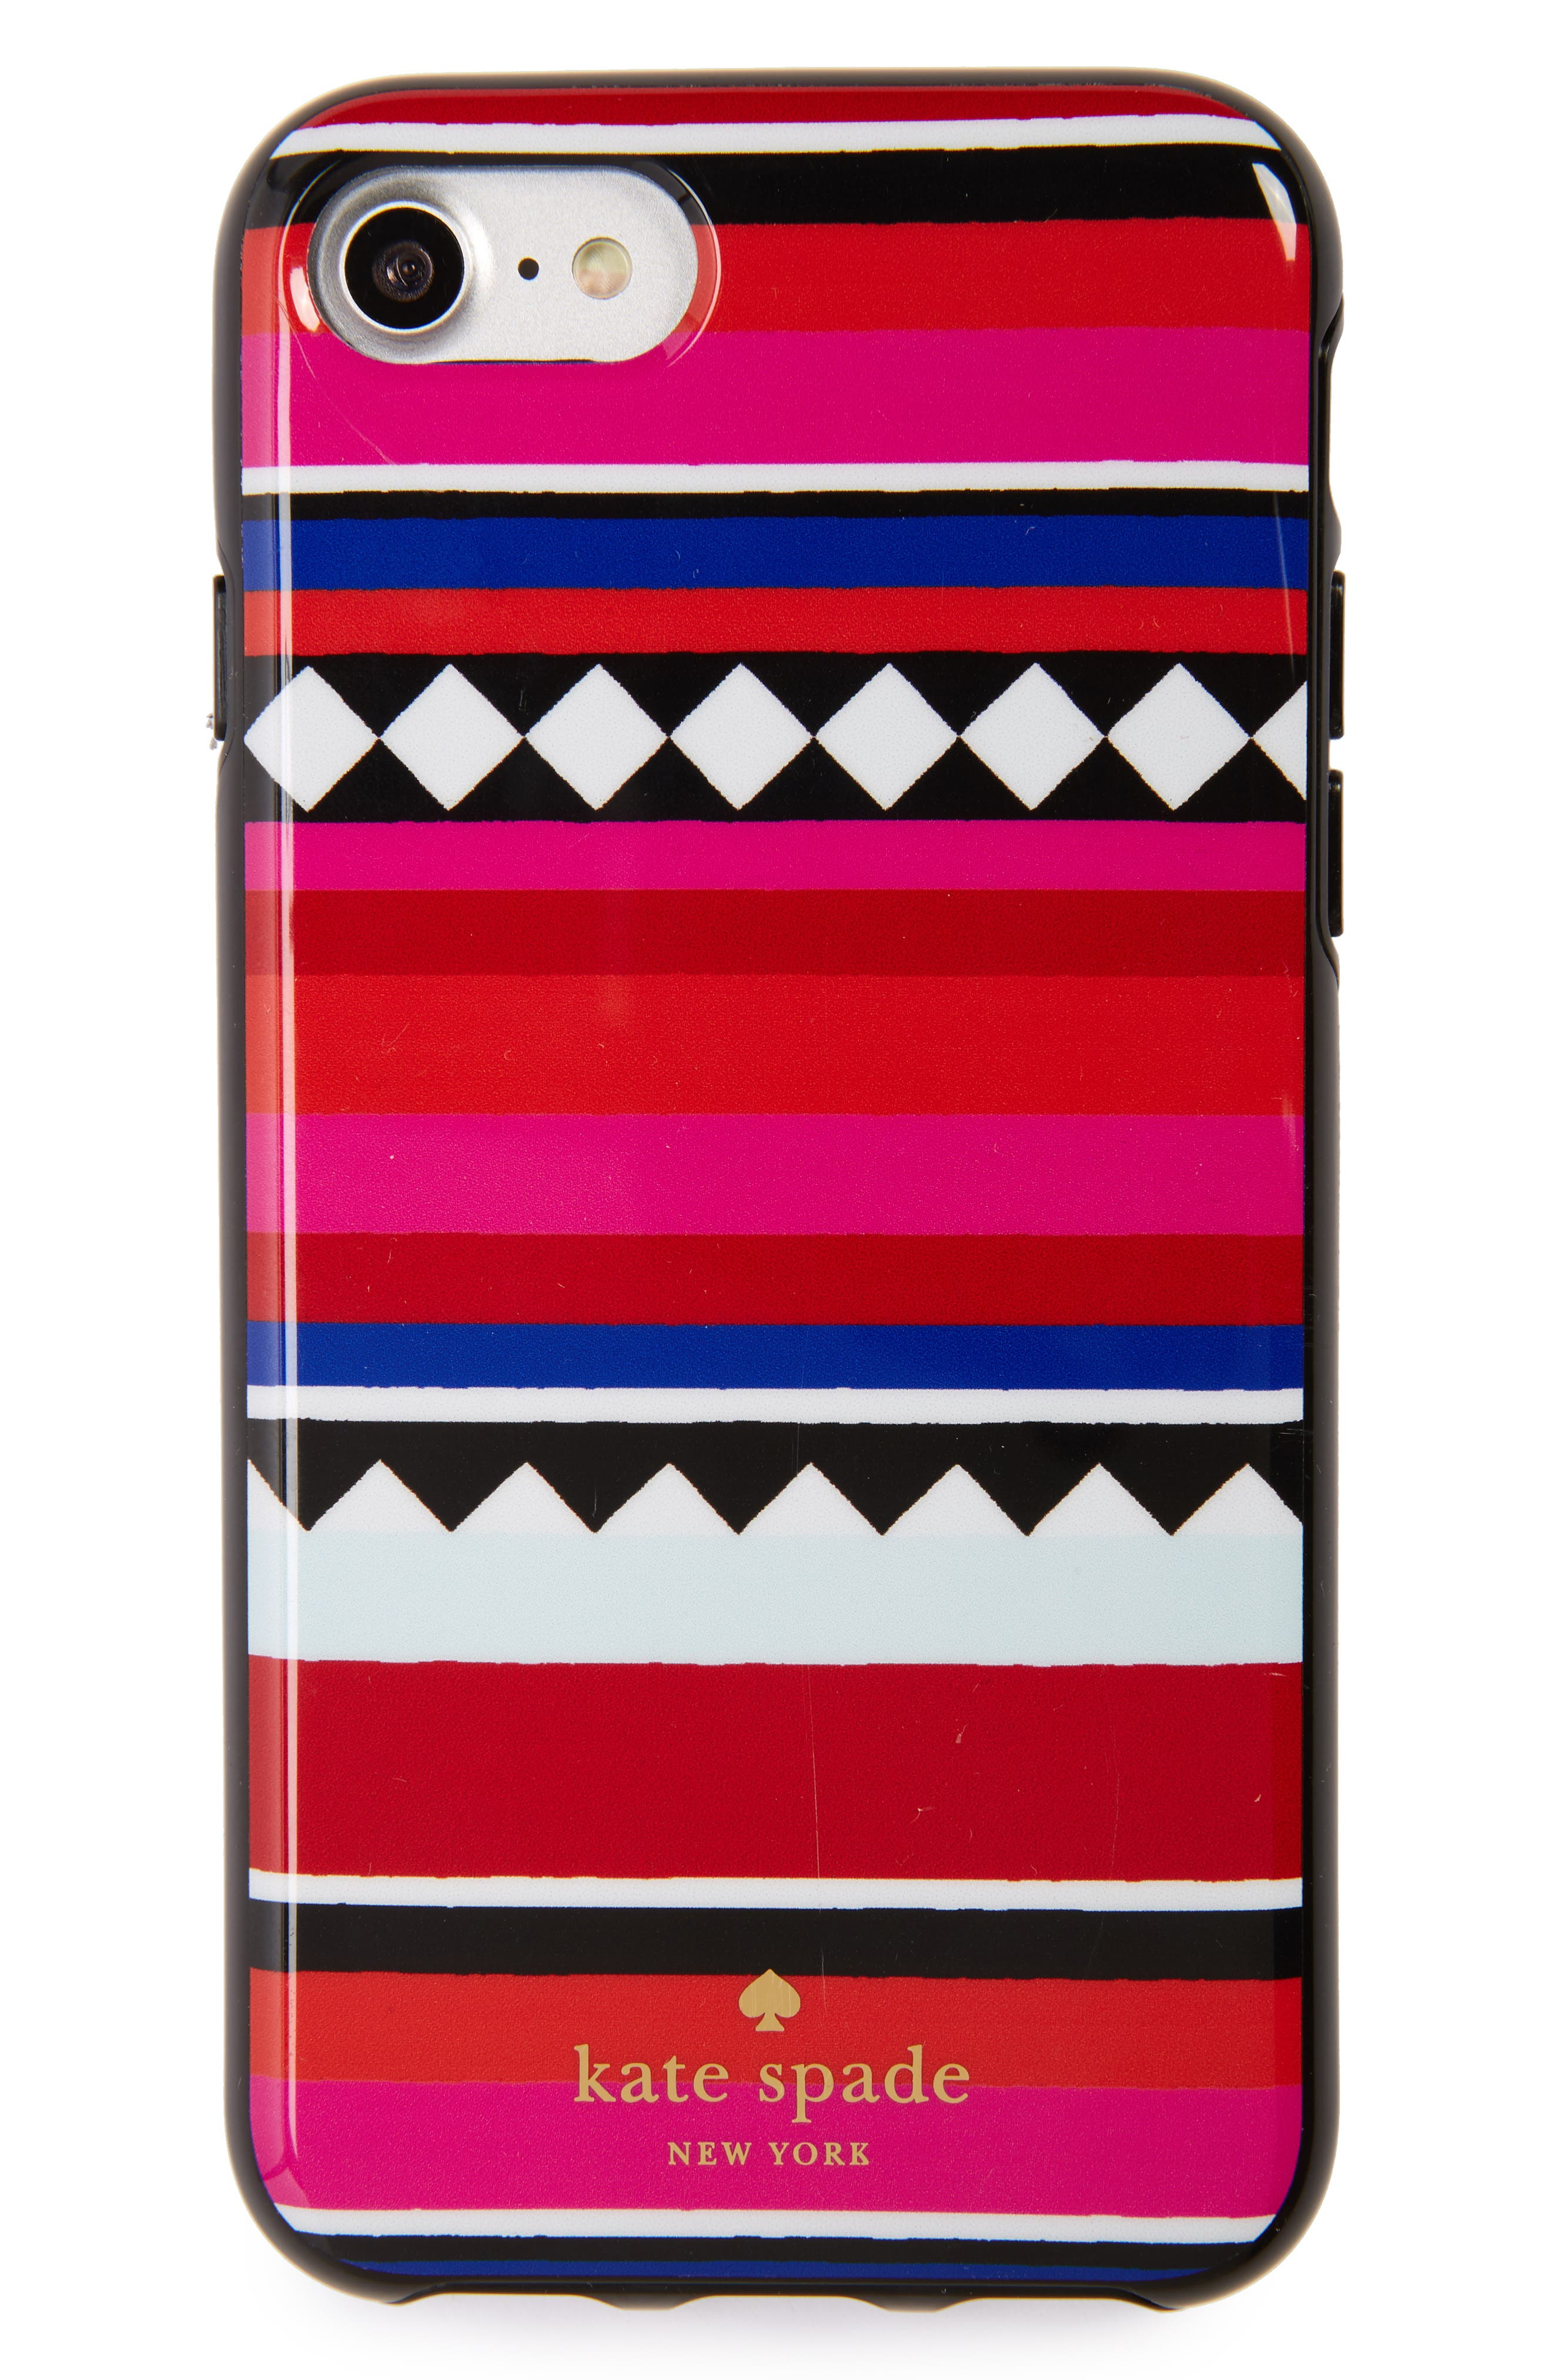 KATE SPADE NEW YORK geo stripe iPhone 7 & 7 Plus case